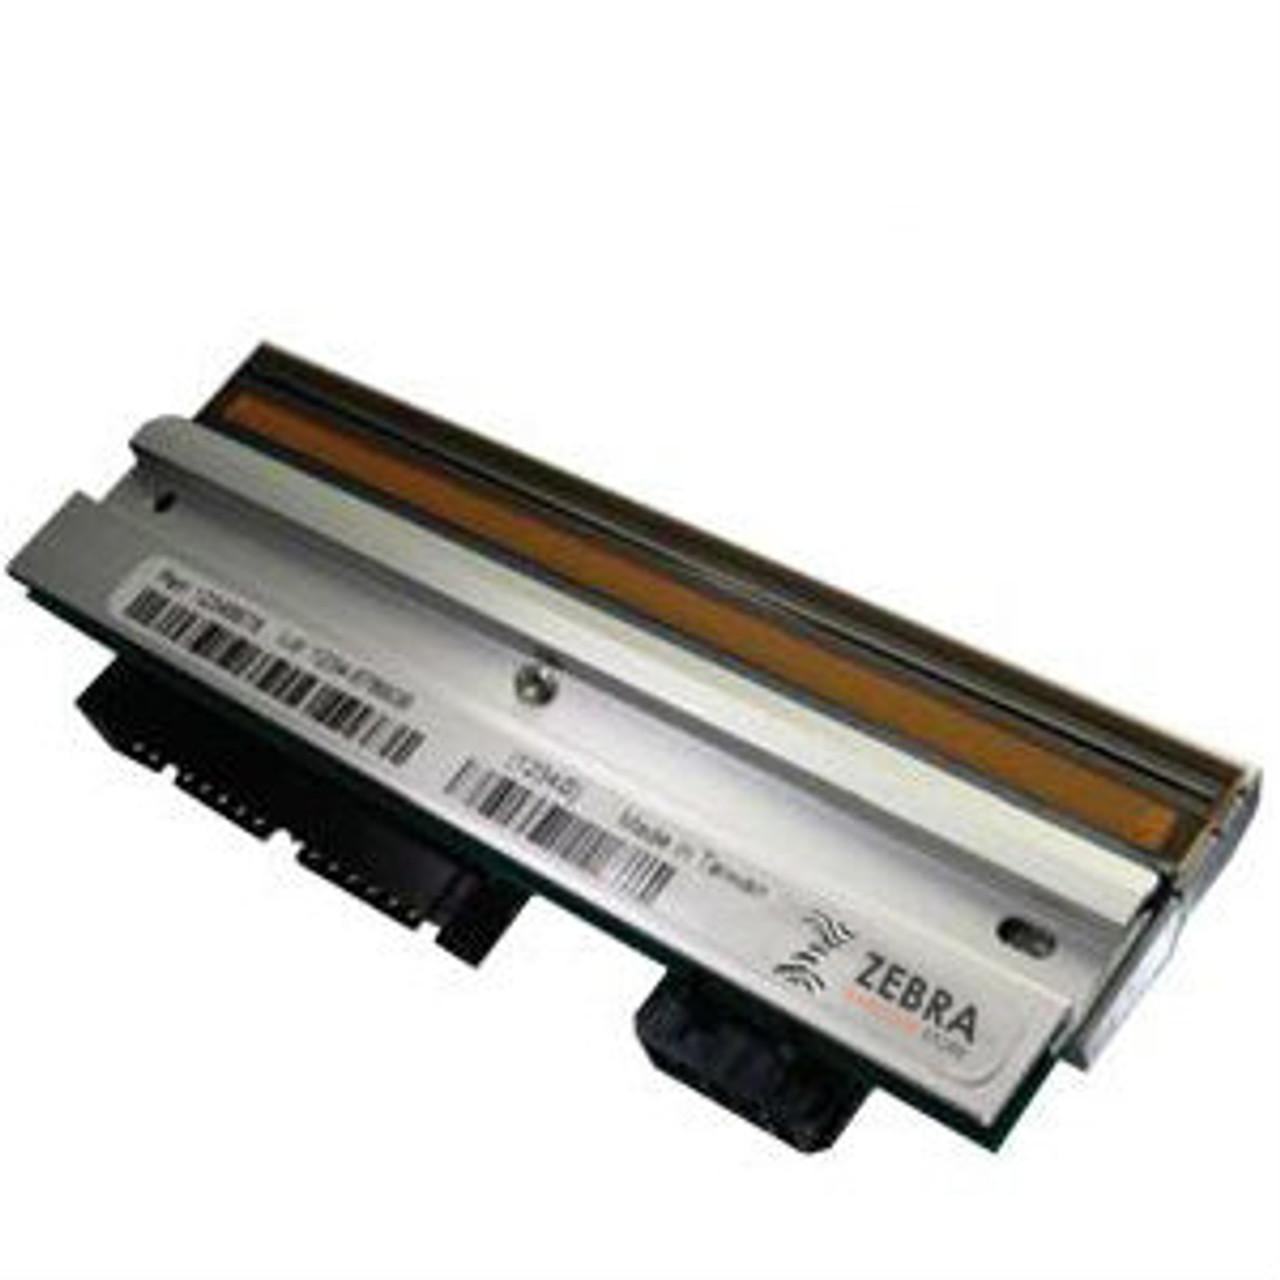 Thermal Printer 203dpi P1053360-018 US New Printhead for Zebra 105SL Plus 105SL